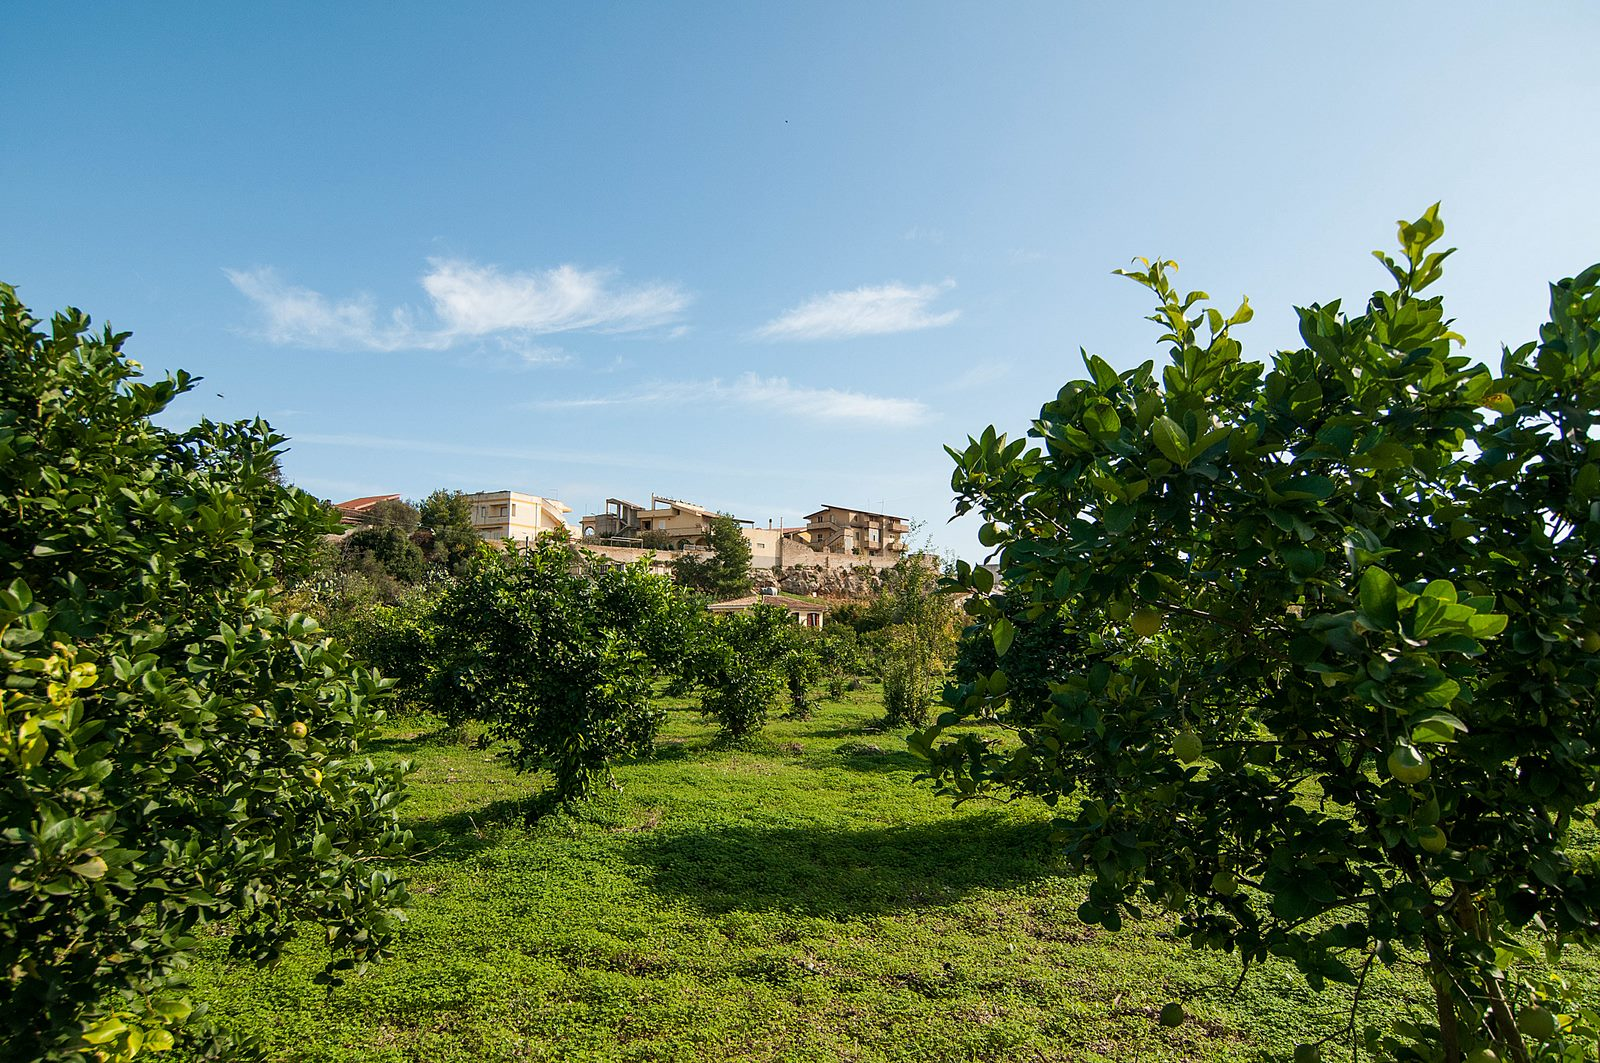 Maison de vacances Villetta a Lido (1540086), Lido di Noto, Siracusa, Sicile, Italie, image 28